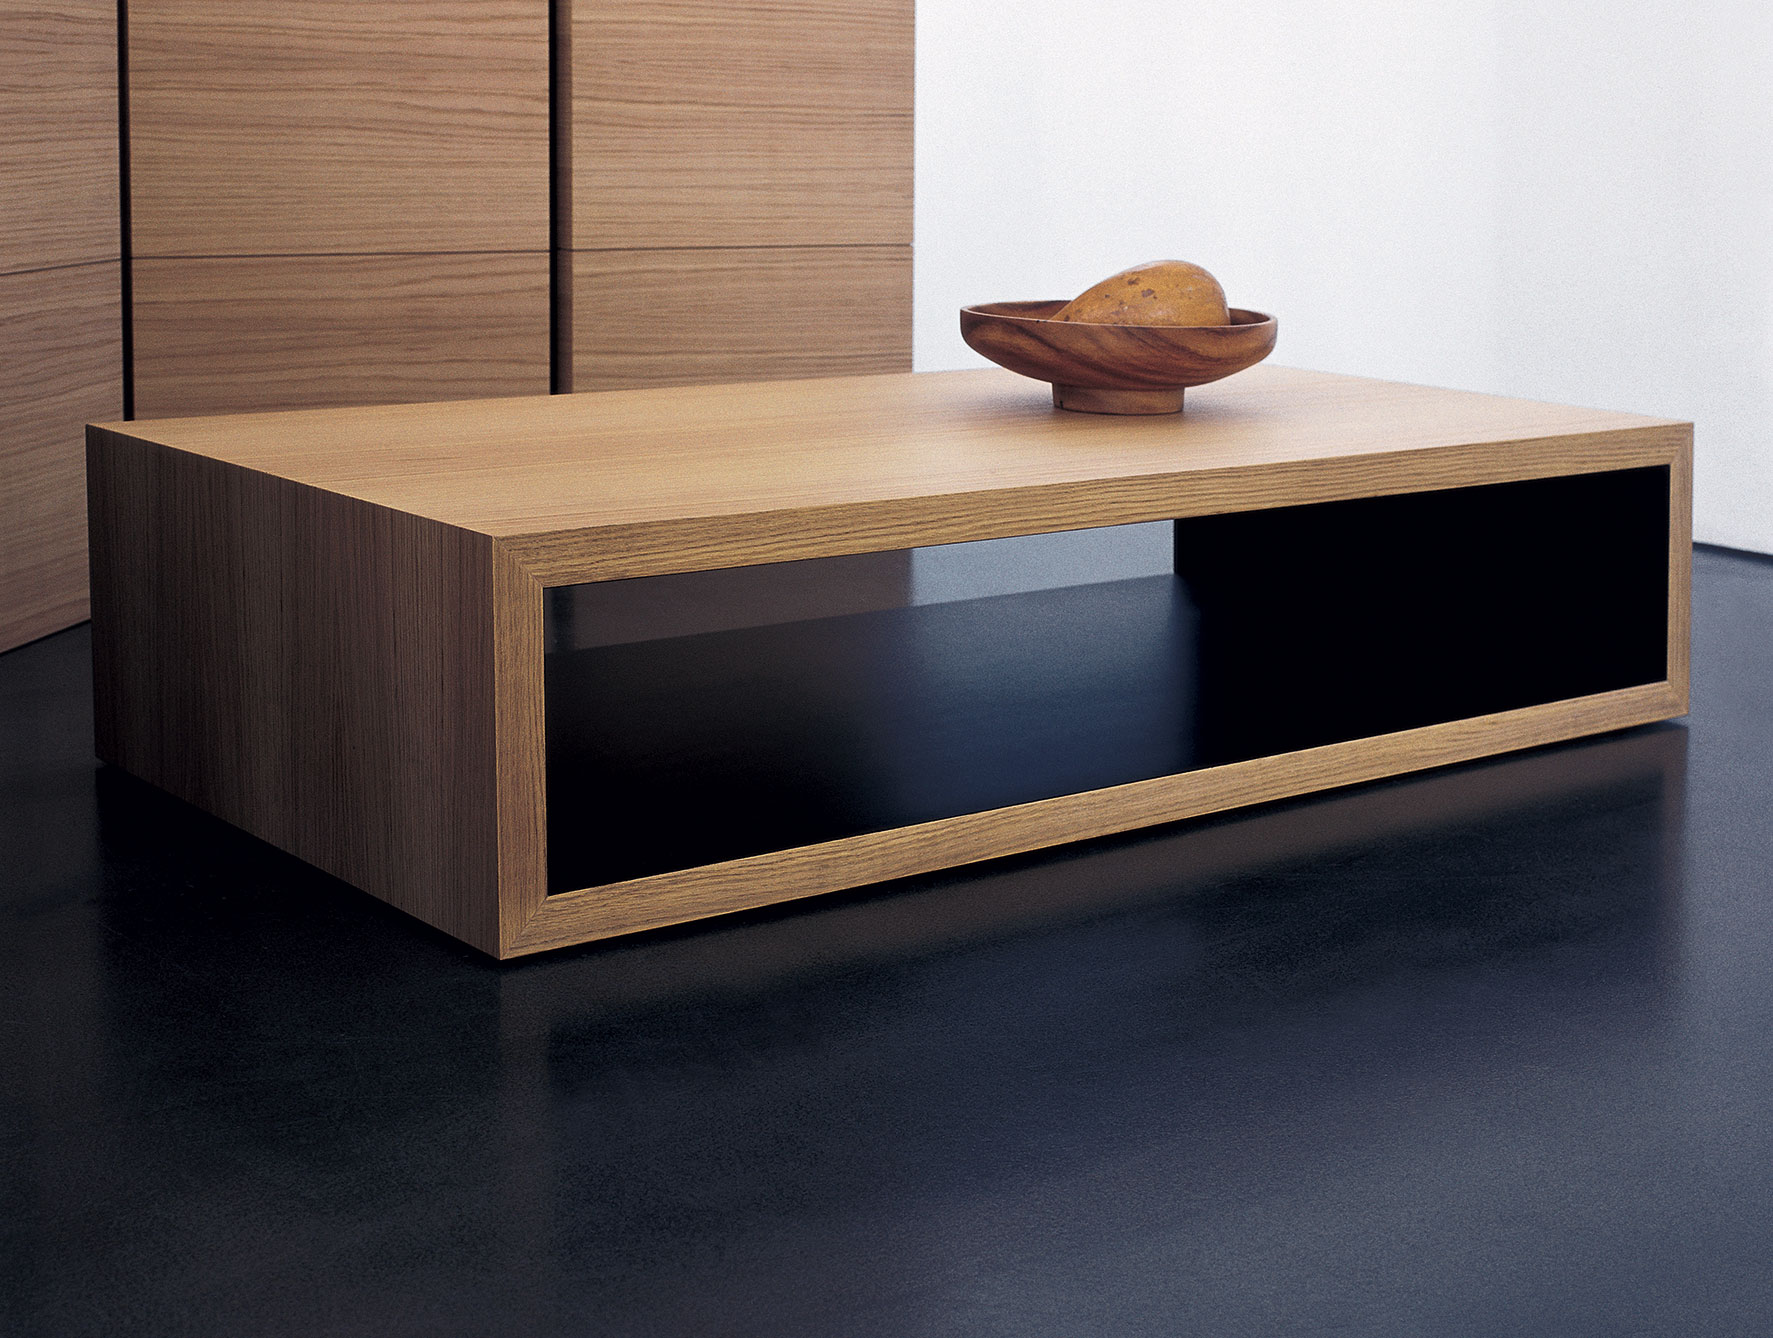 best collection of modern walnut coffee tables - modernwoodcoffeetablereclaimedmetalmidcentury